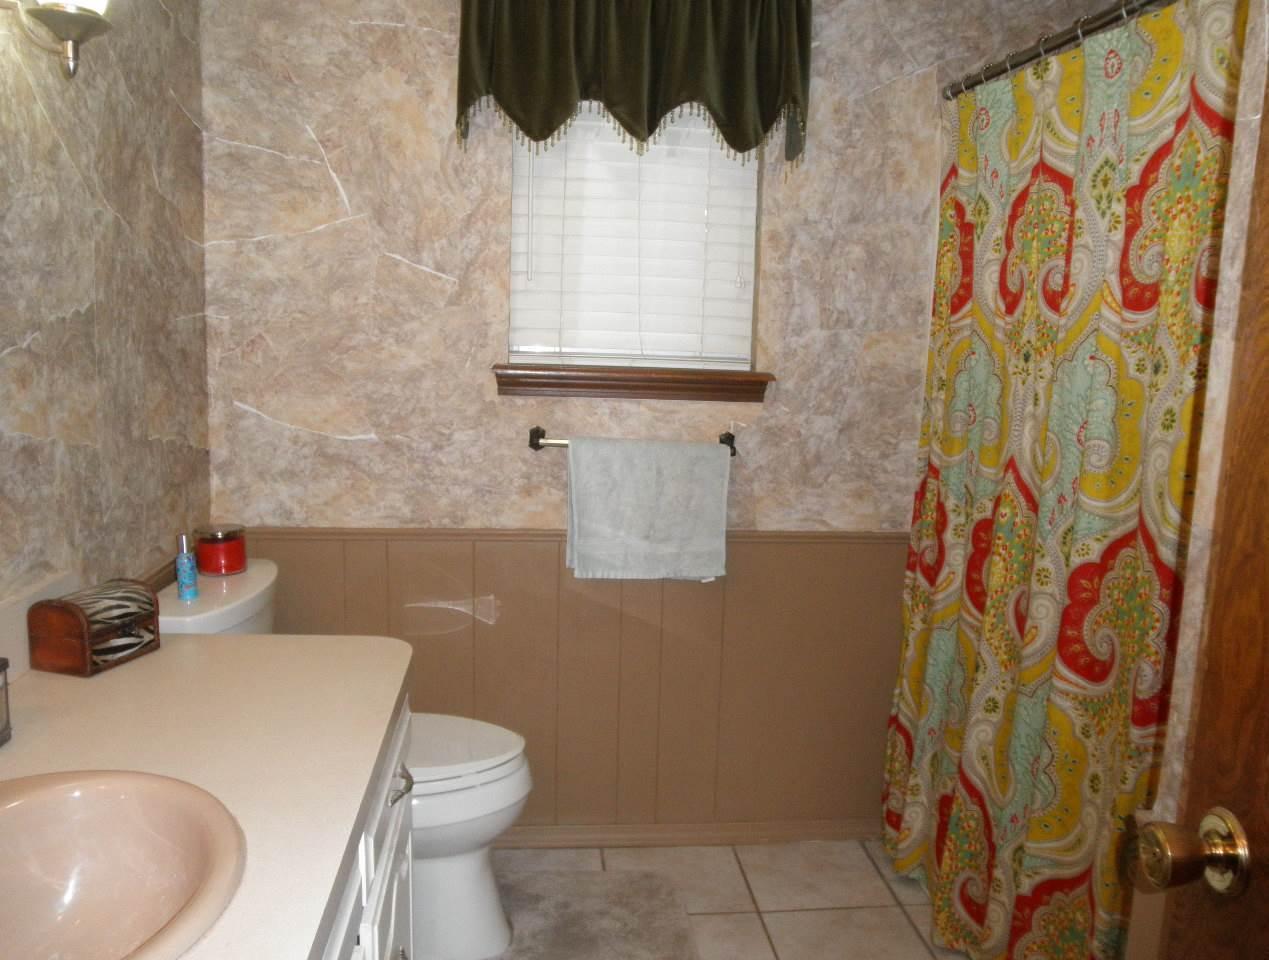 Sold Cross Sale W/ MLS | 2805 Ames  Ponca City, OK  20